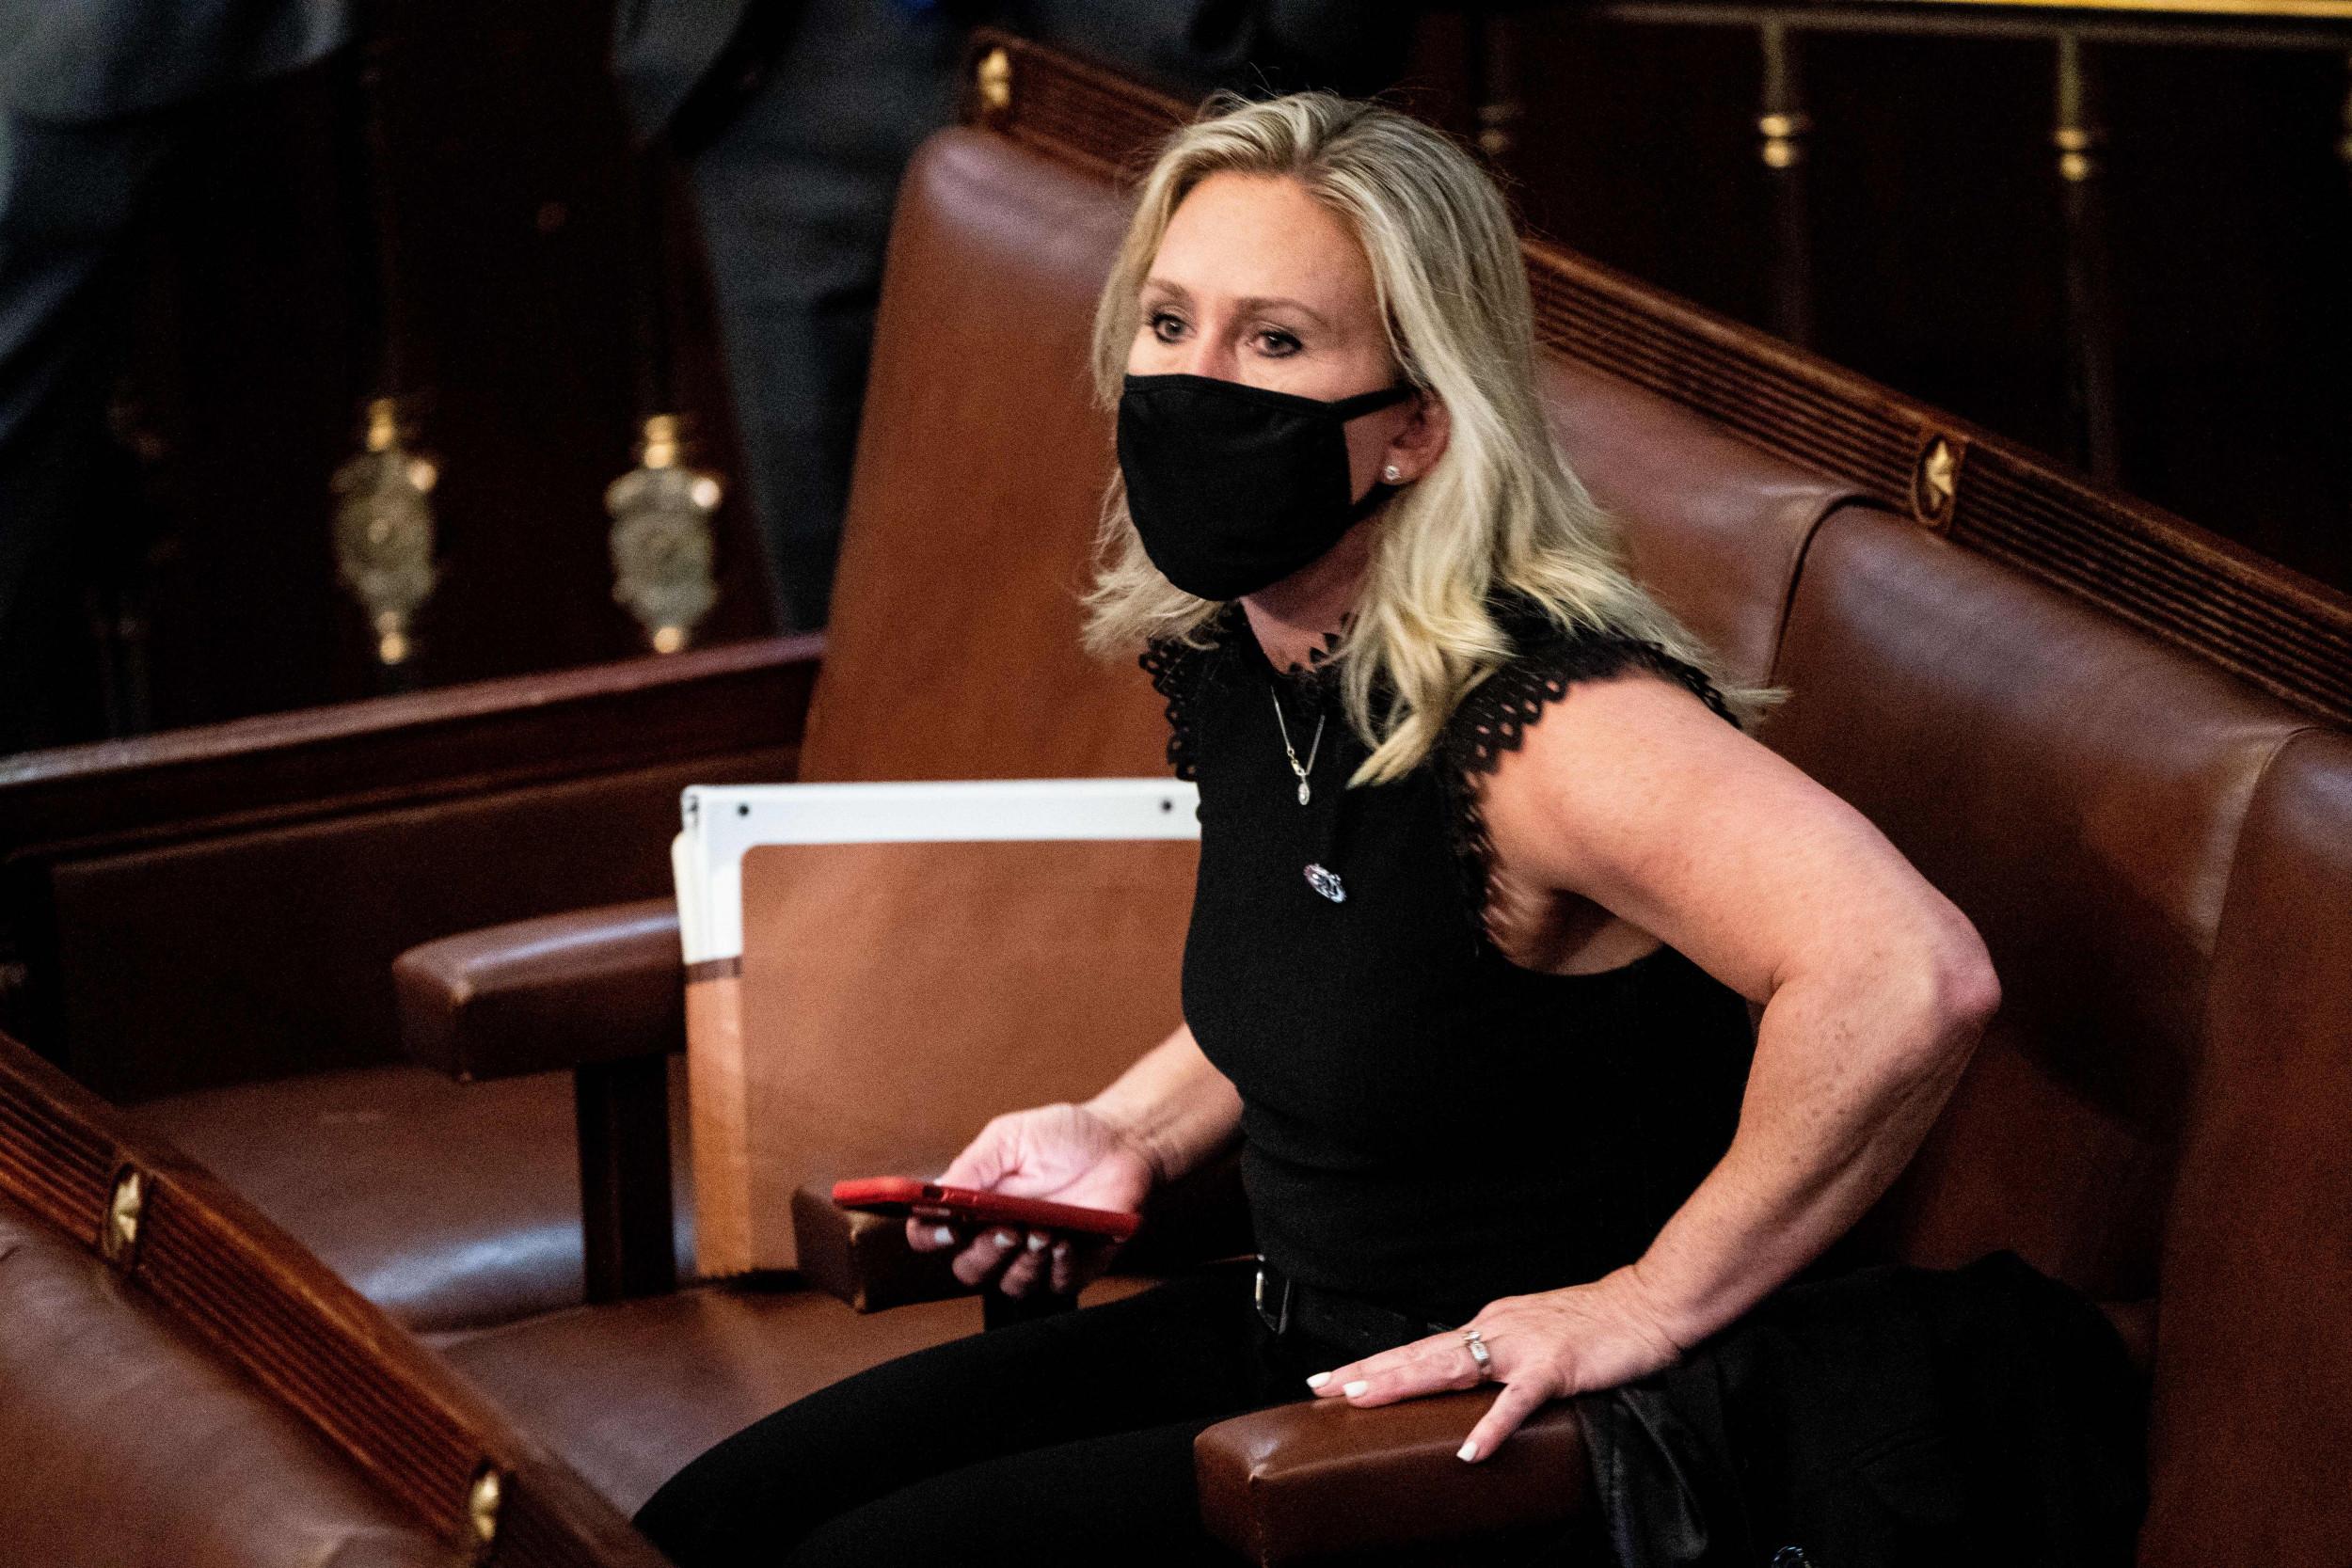 Marjorie Taylor Greene files impeachment articles against Biden, fundraises off effort